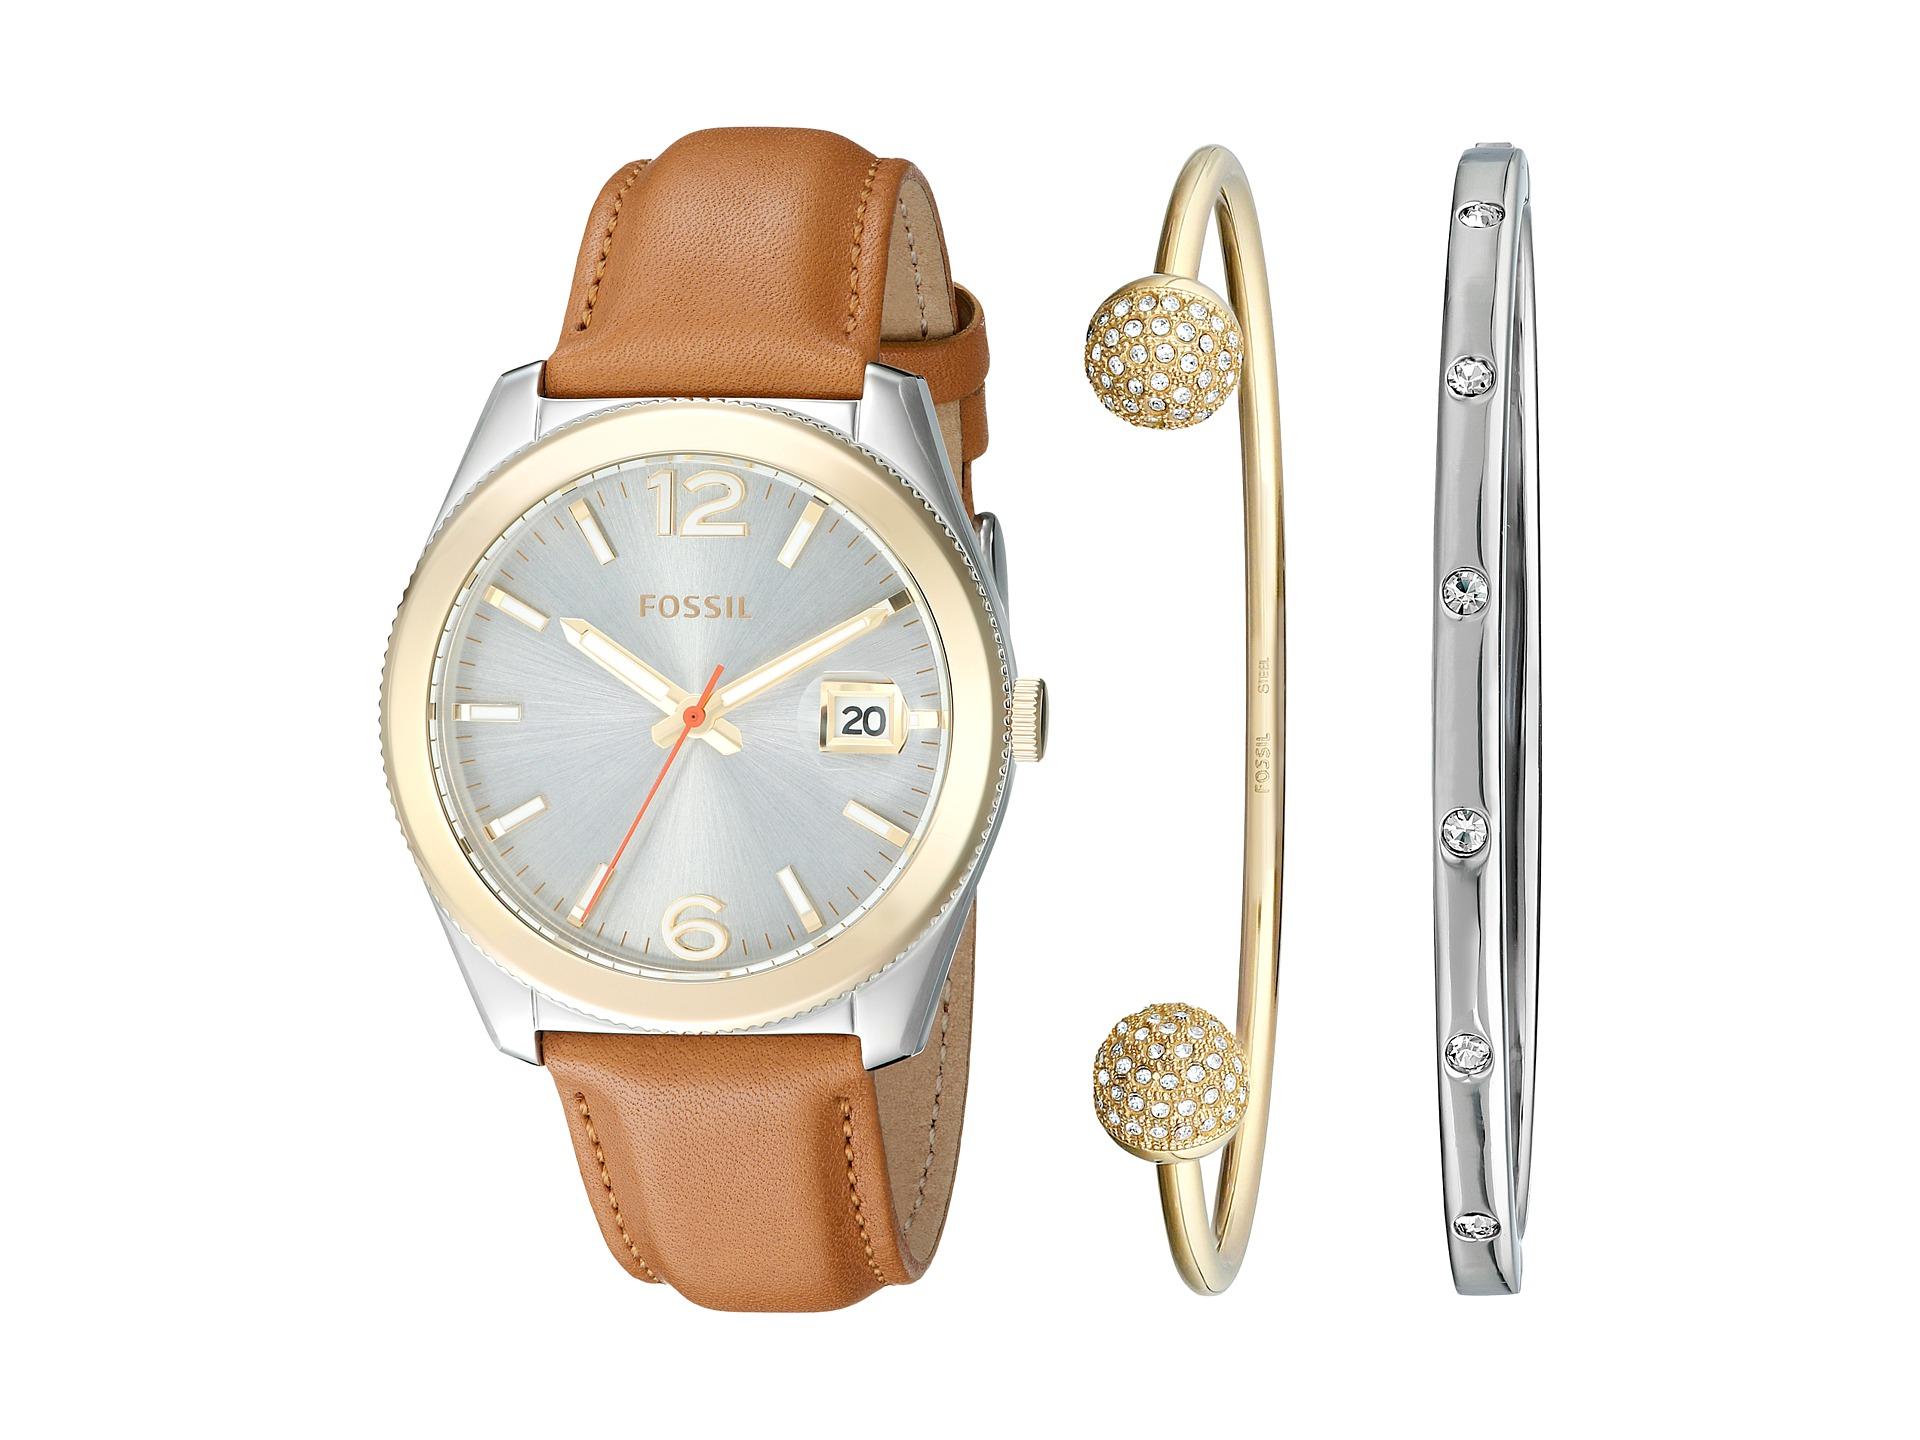 Boyfriend Bracelet Watch Photos Fossil Perfect Es4093 Blue Navy Lyst Leather And Set